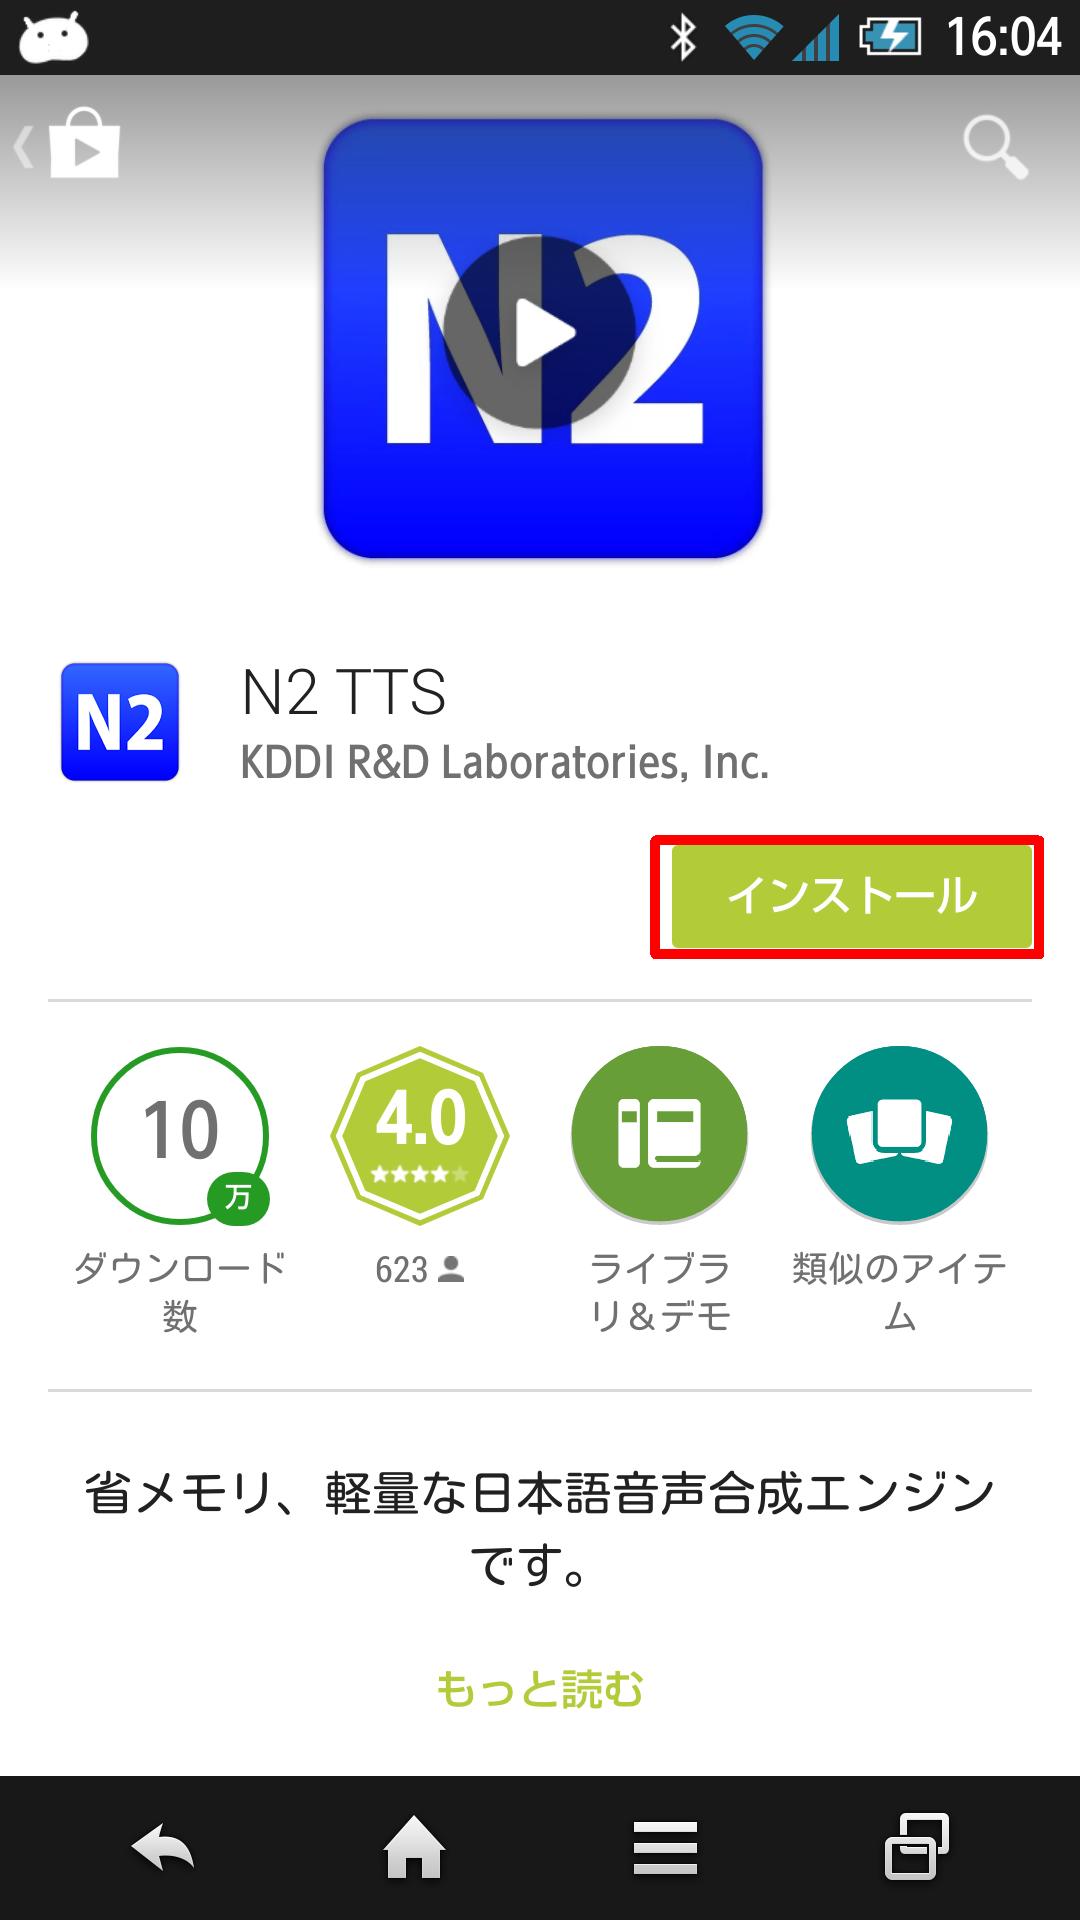 N2TTS_01